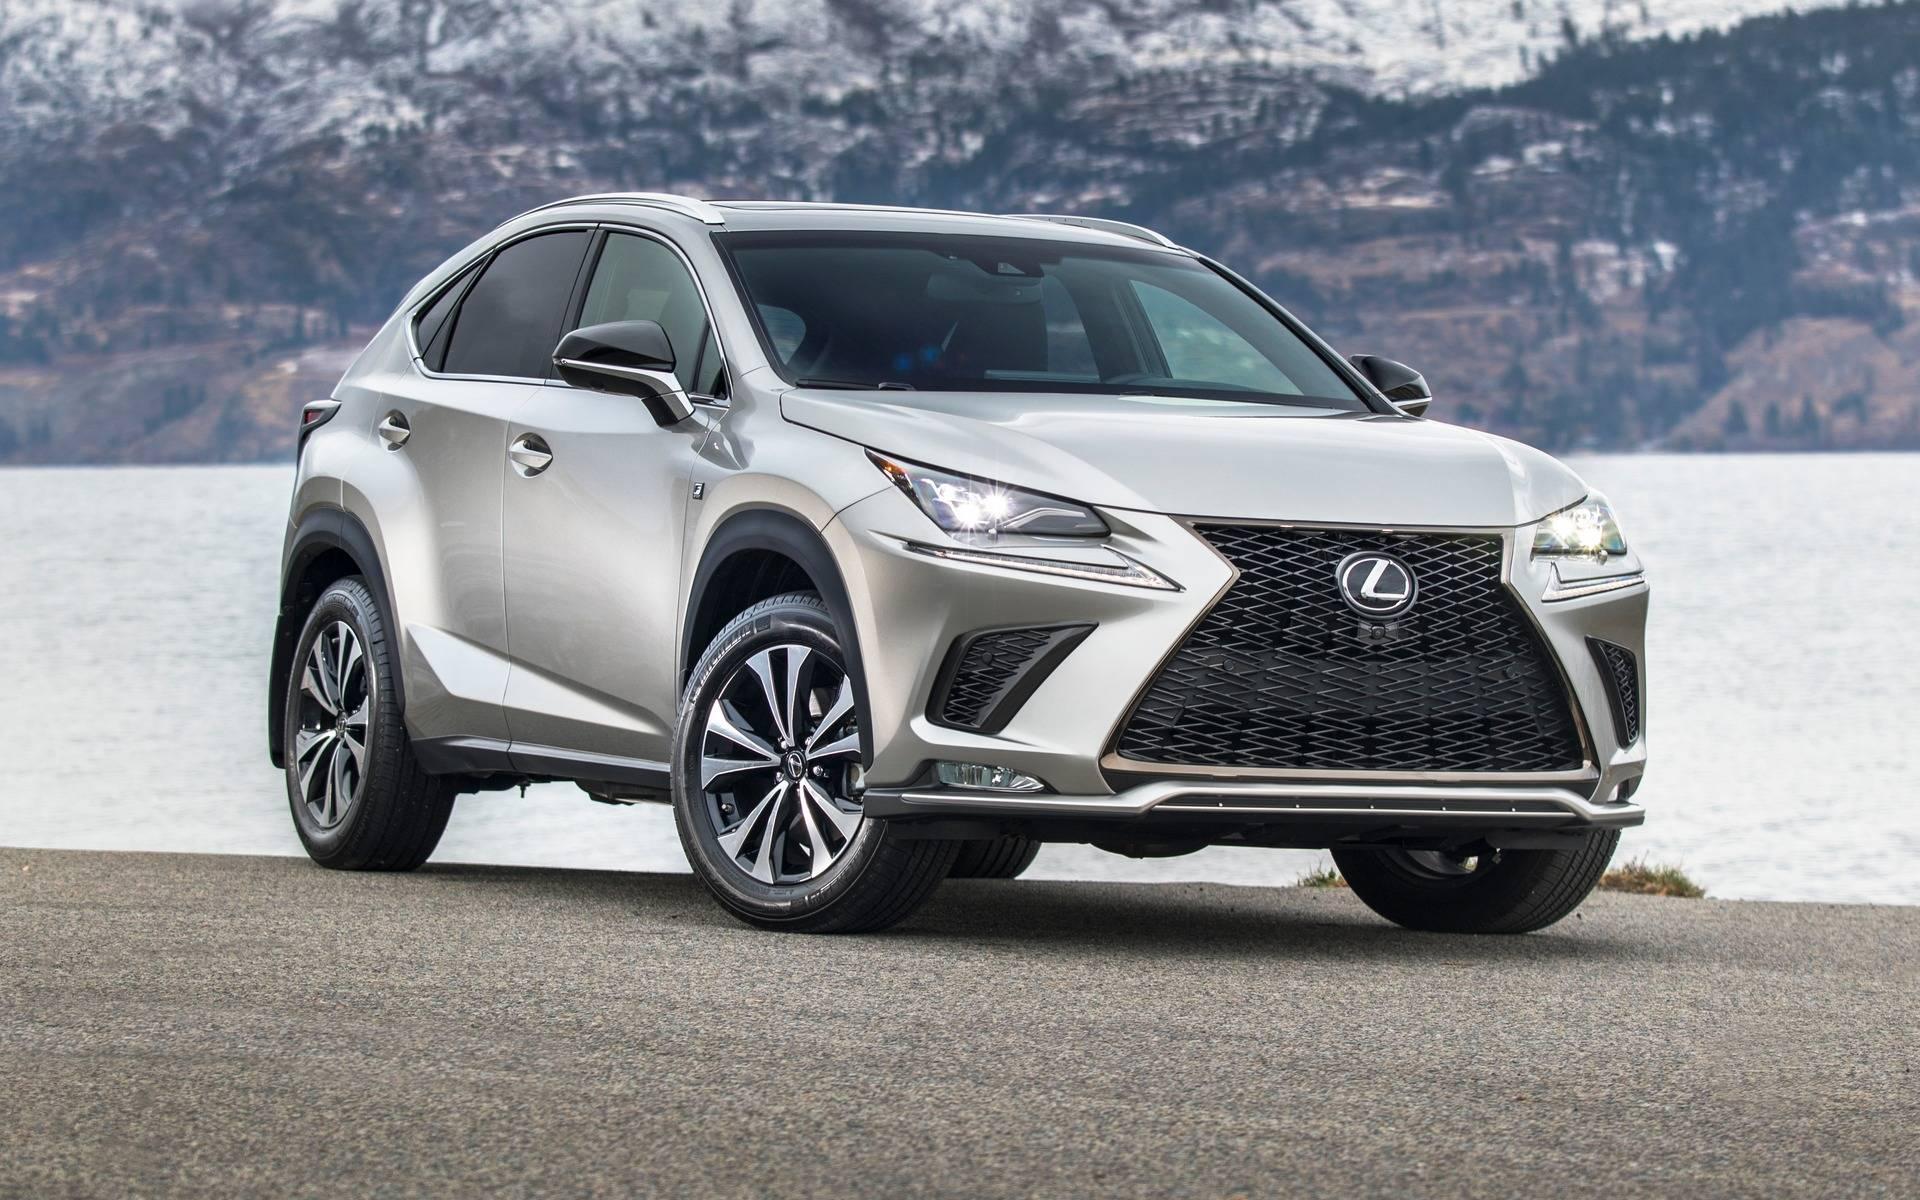 Kelebihan Toyota Lexus Tangguh